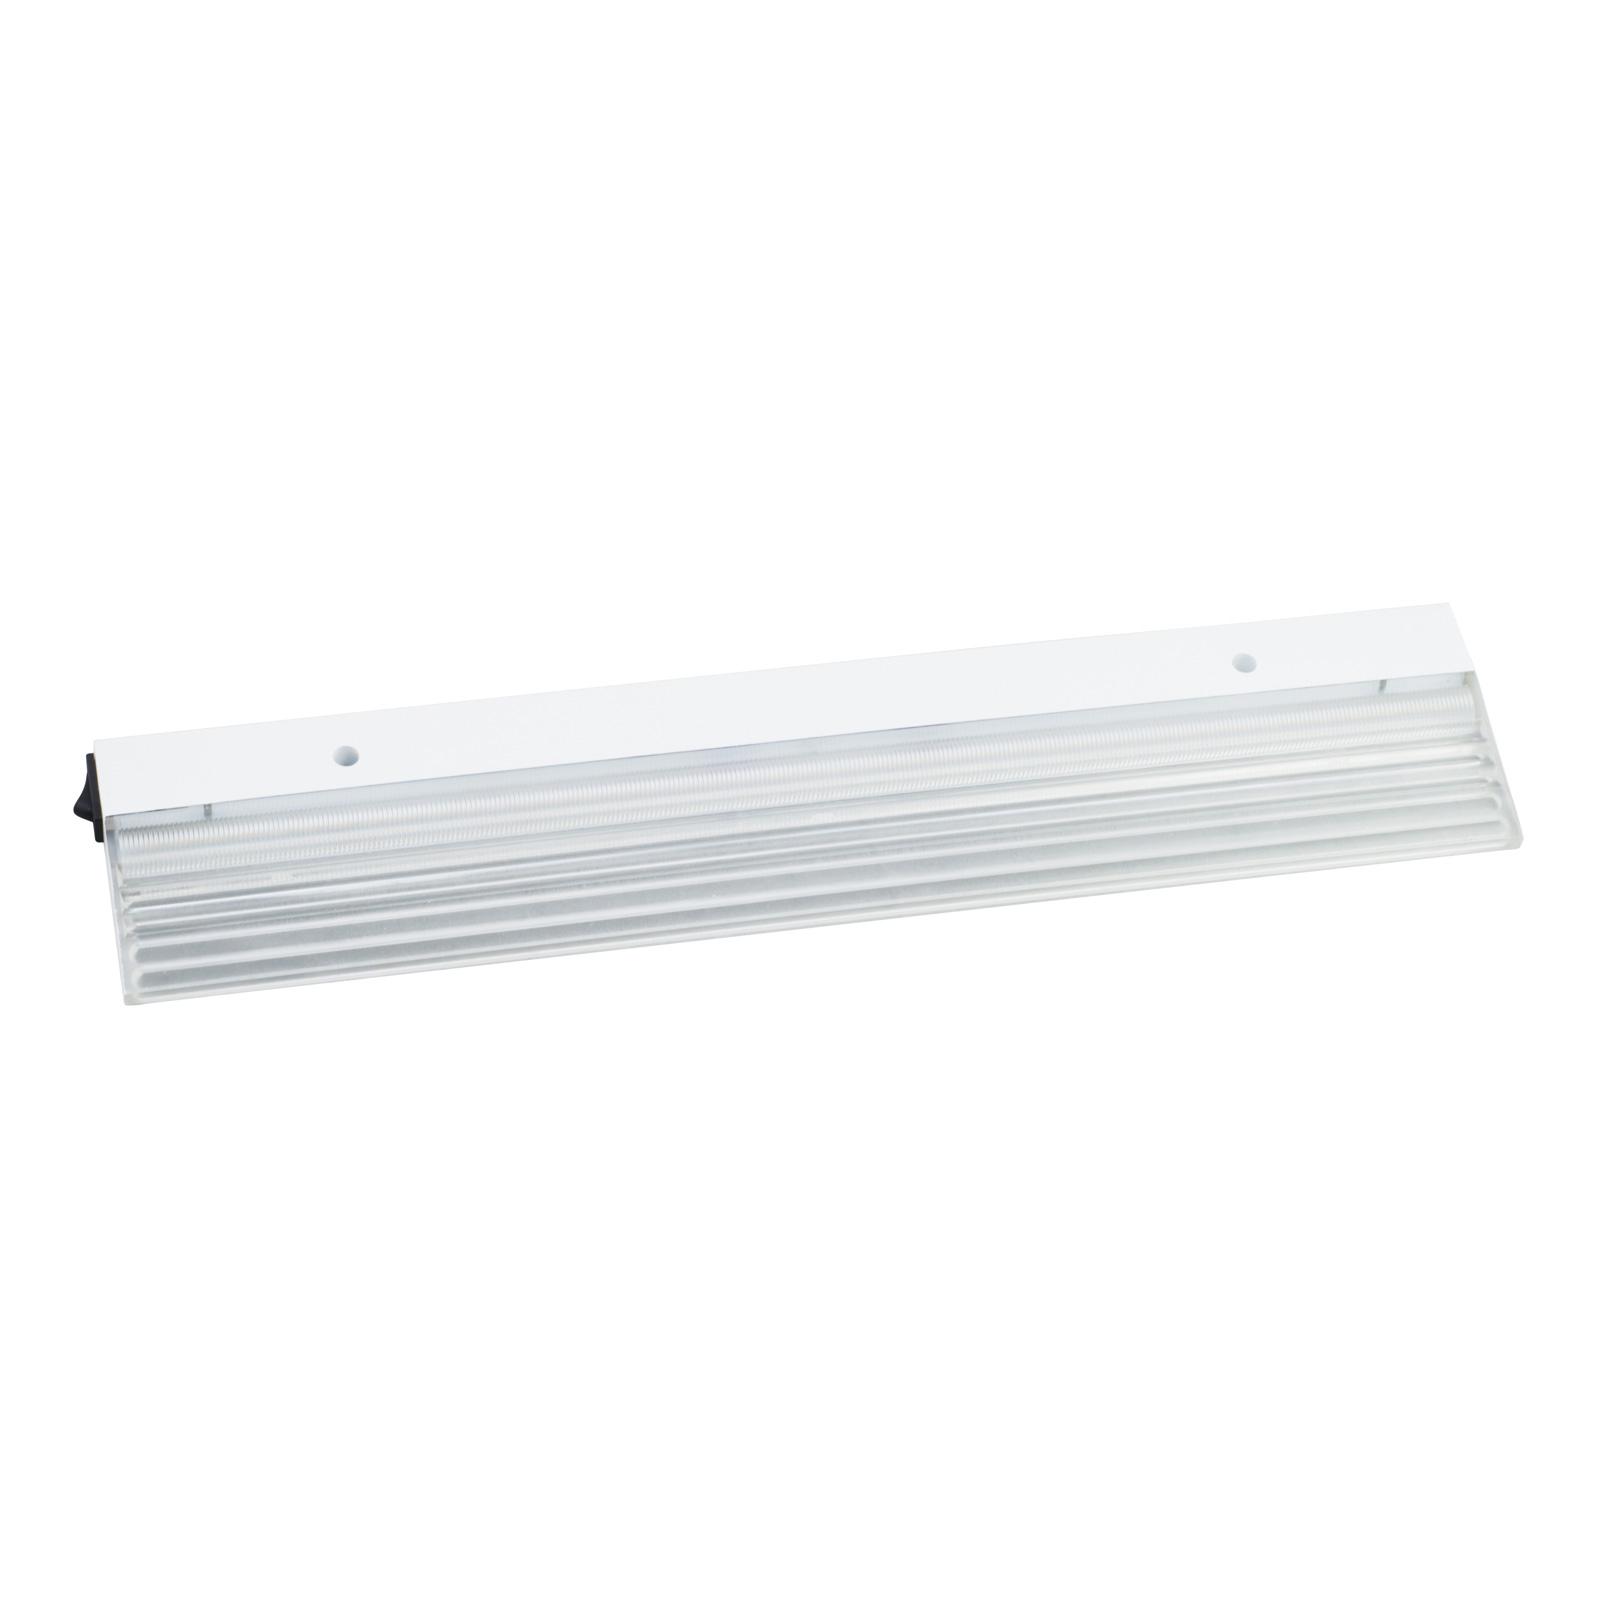 LED-kaapinalusvalaisin Unta Acryl